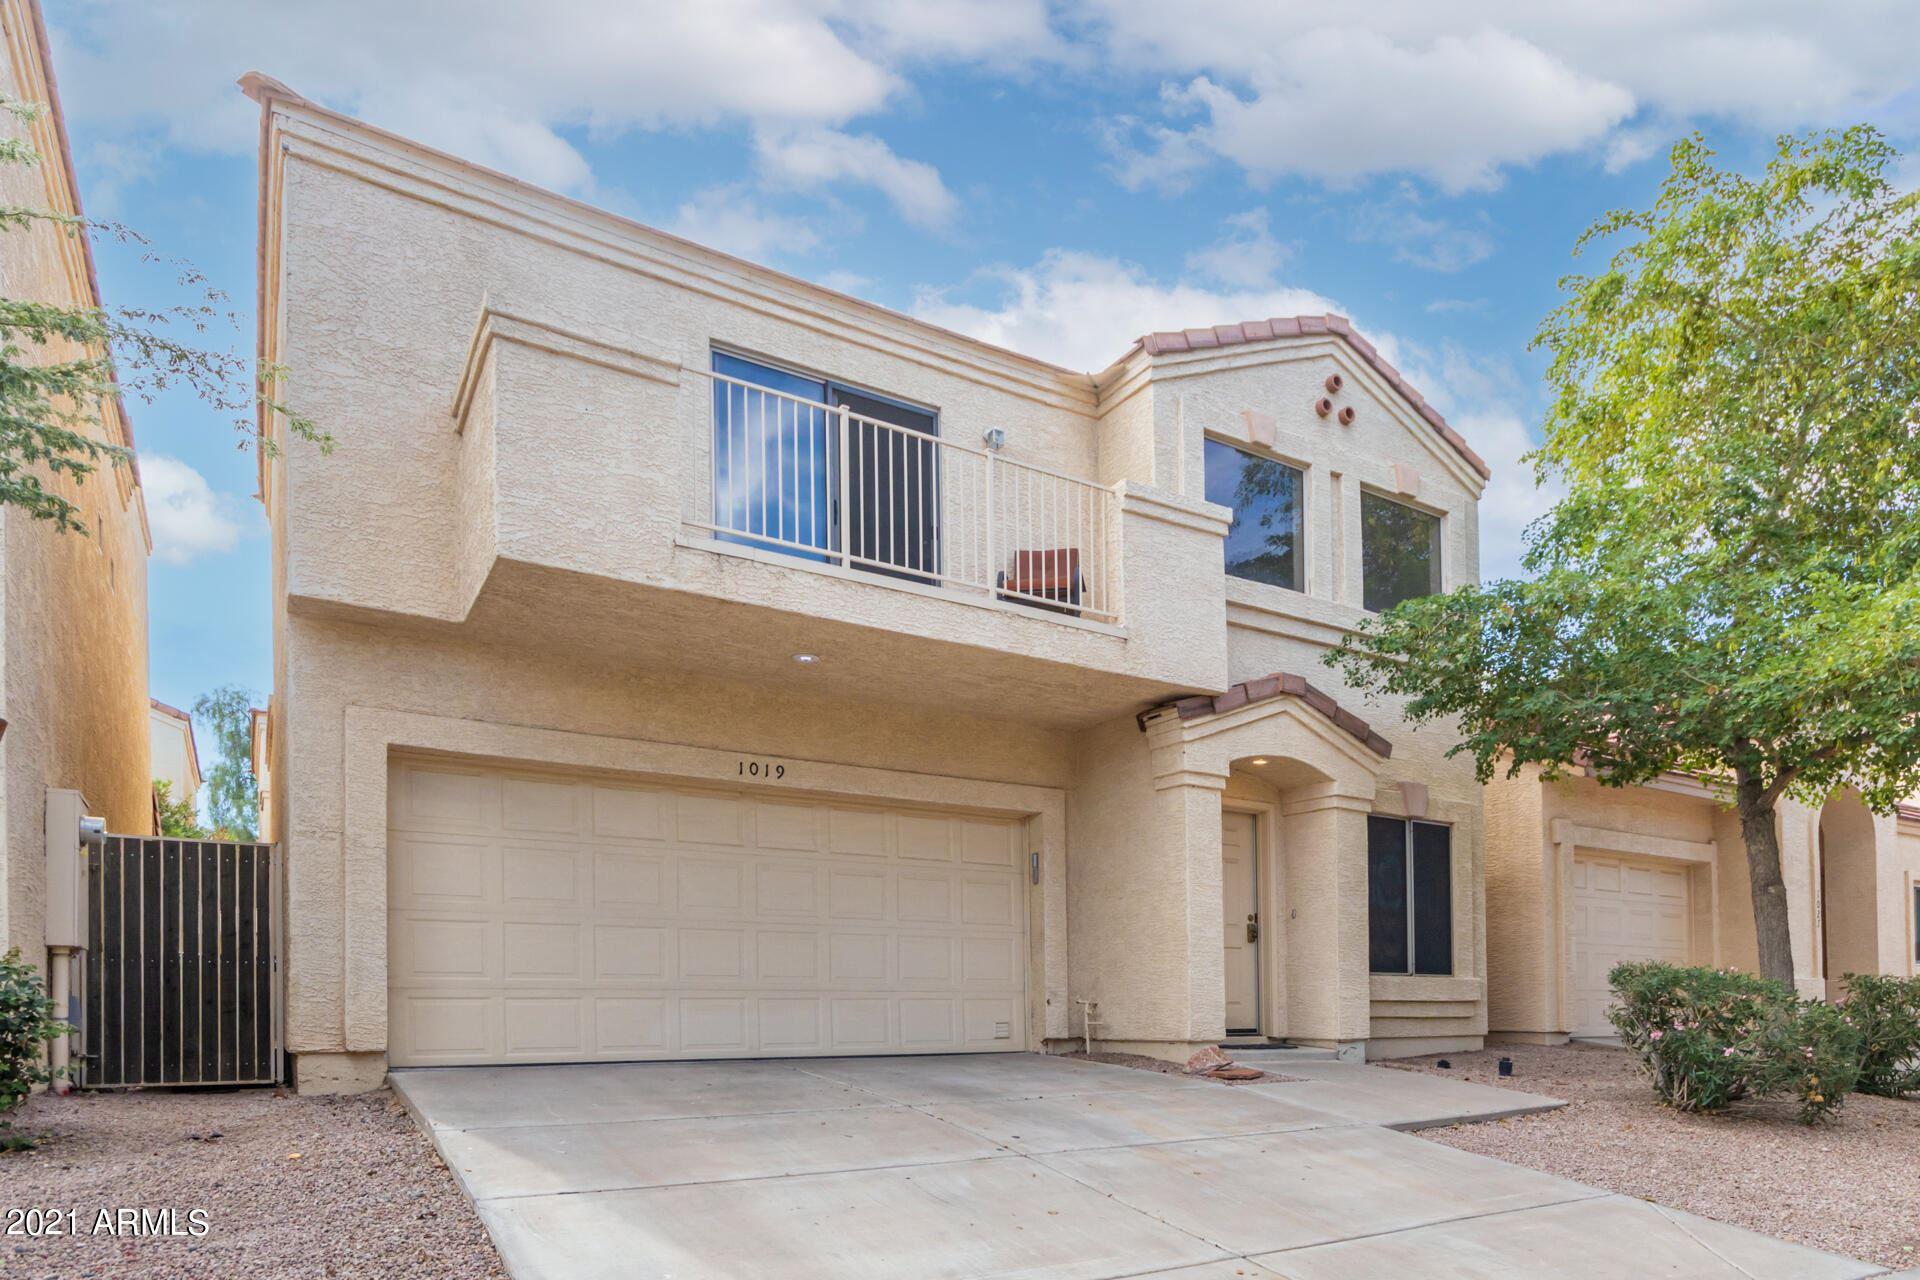 Photo of 1019 W JULIE Drive, Tempe, AZ 85283 (MLS # 6311087)